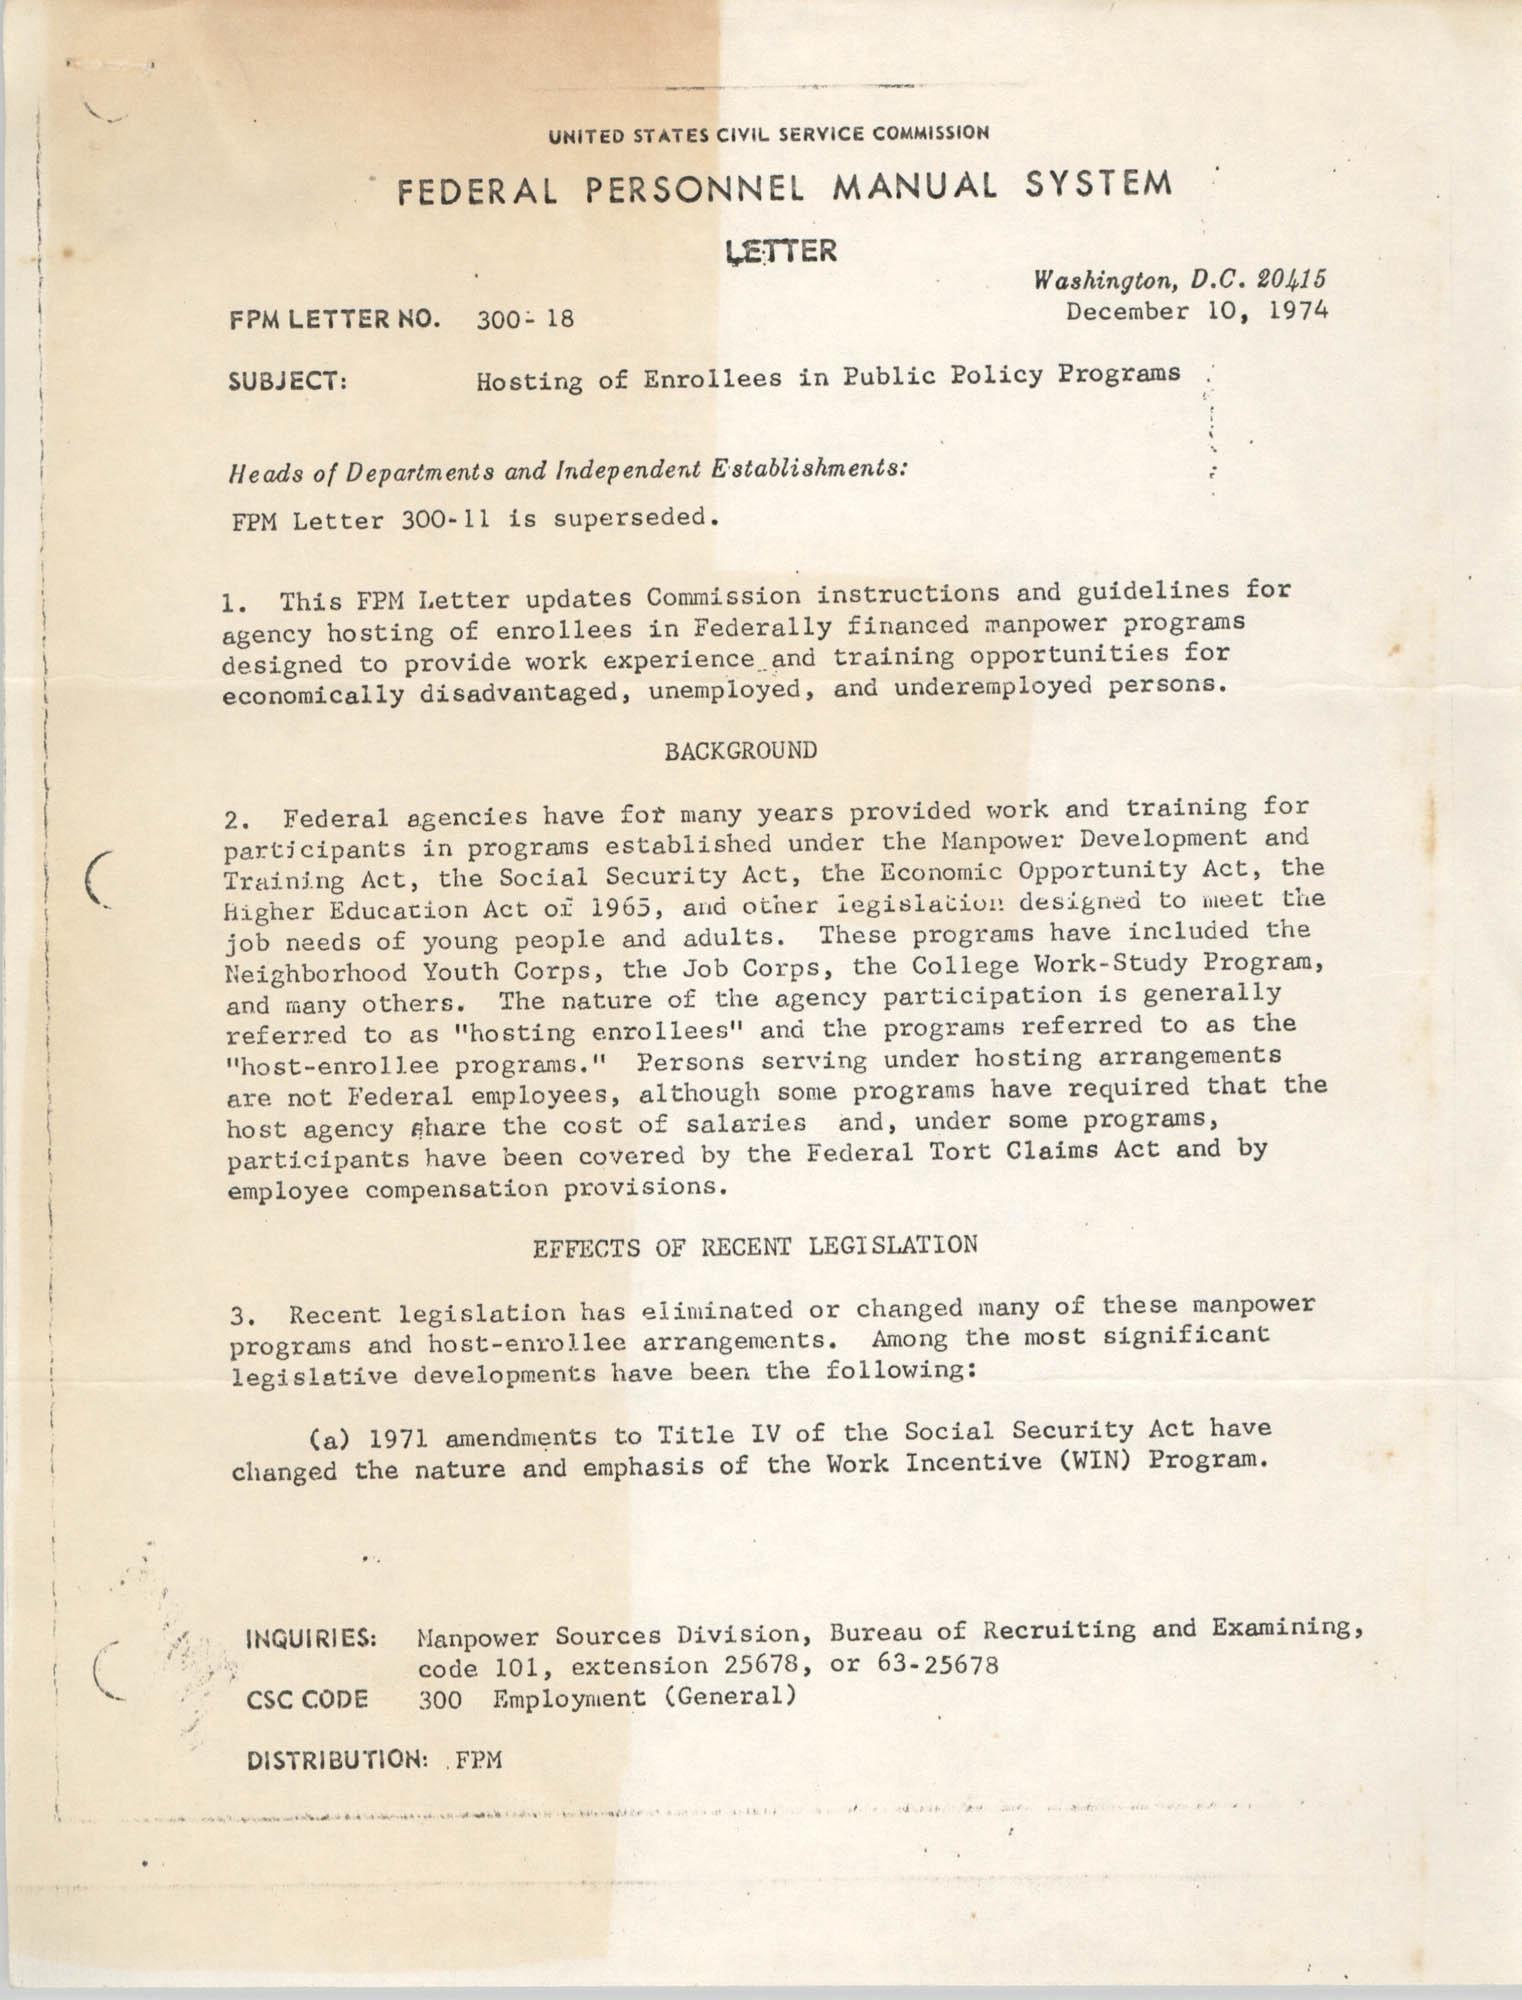 Federal Personnel Manal System Letter 300-18, December 10, 1974